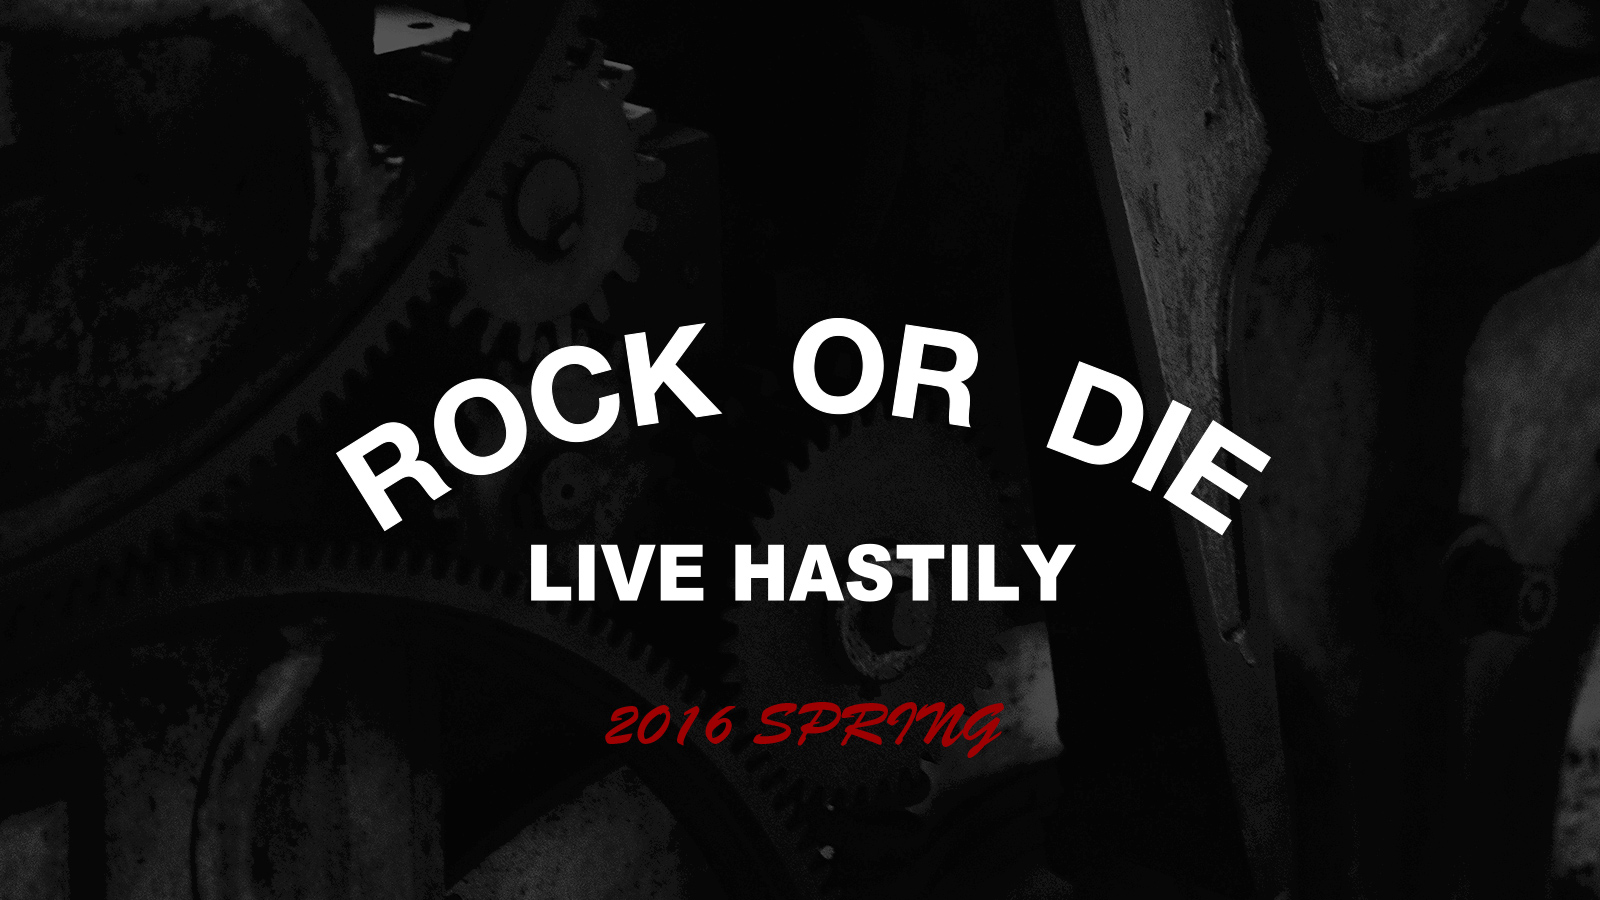 2016 SPRING LIVE HASTILY